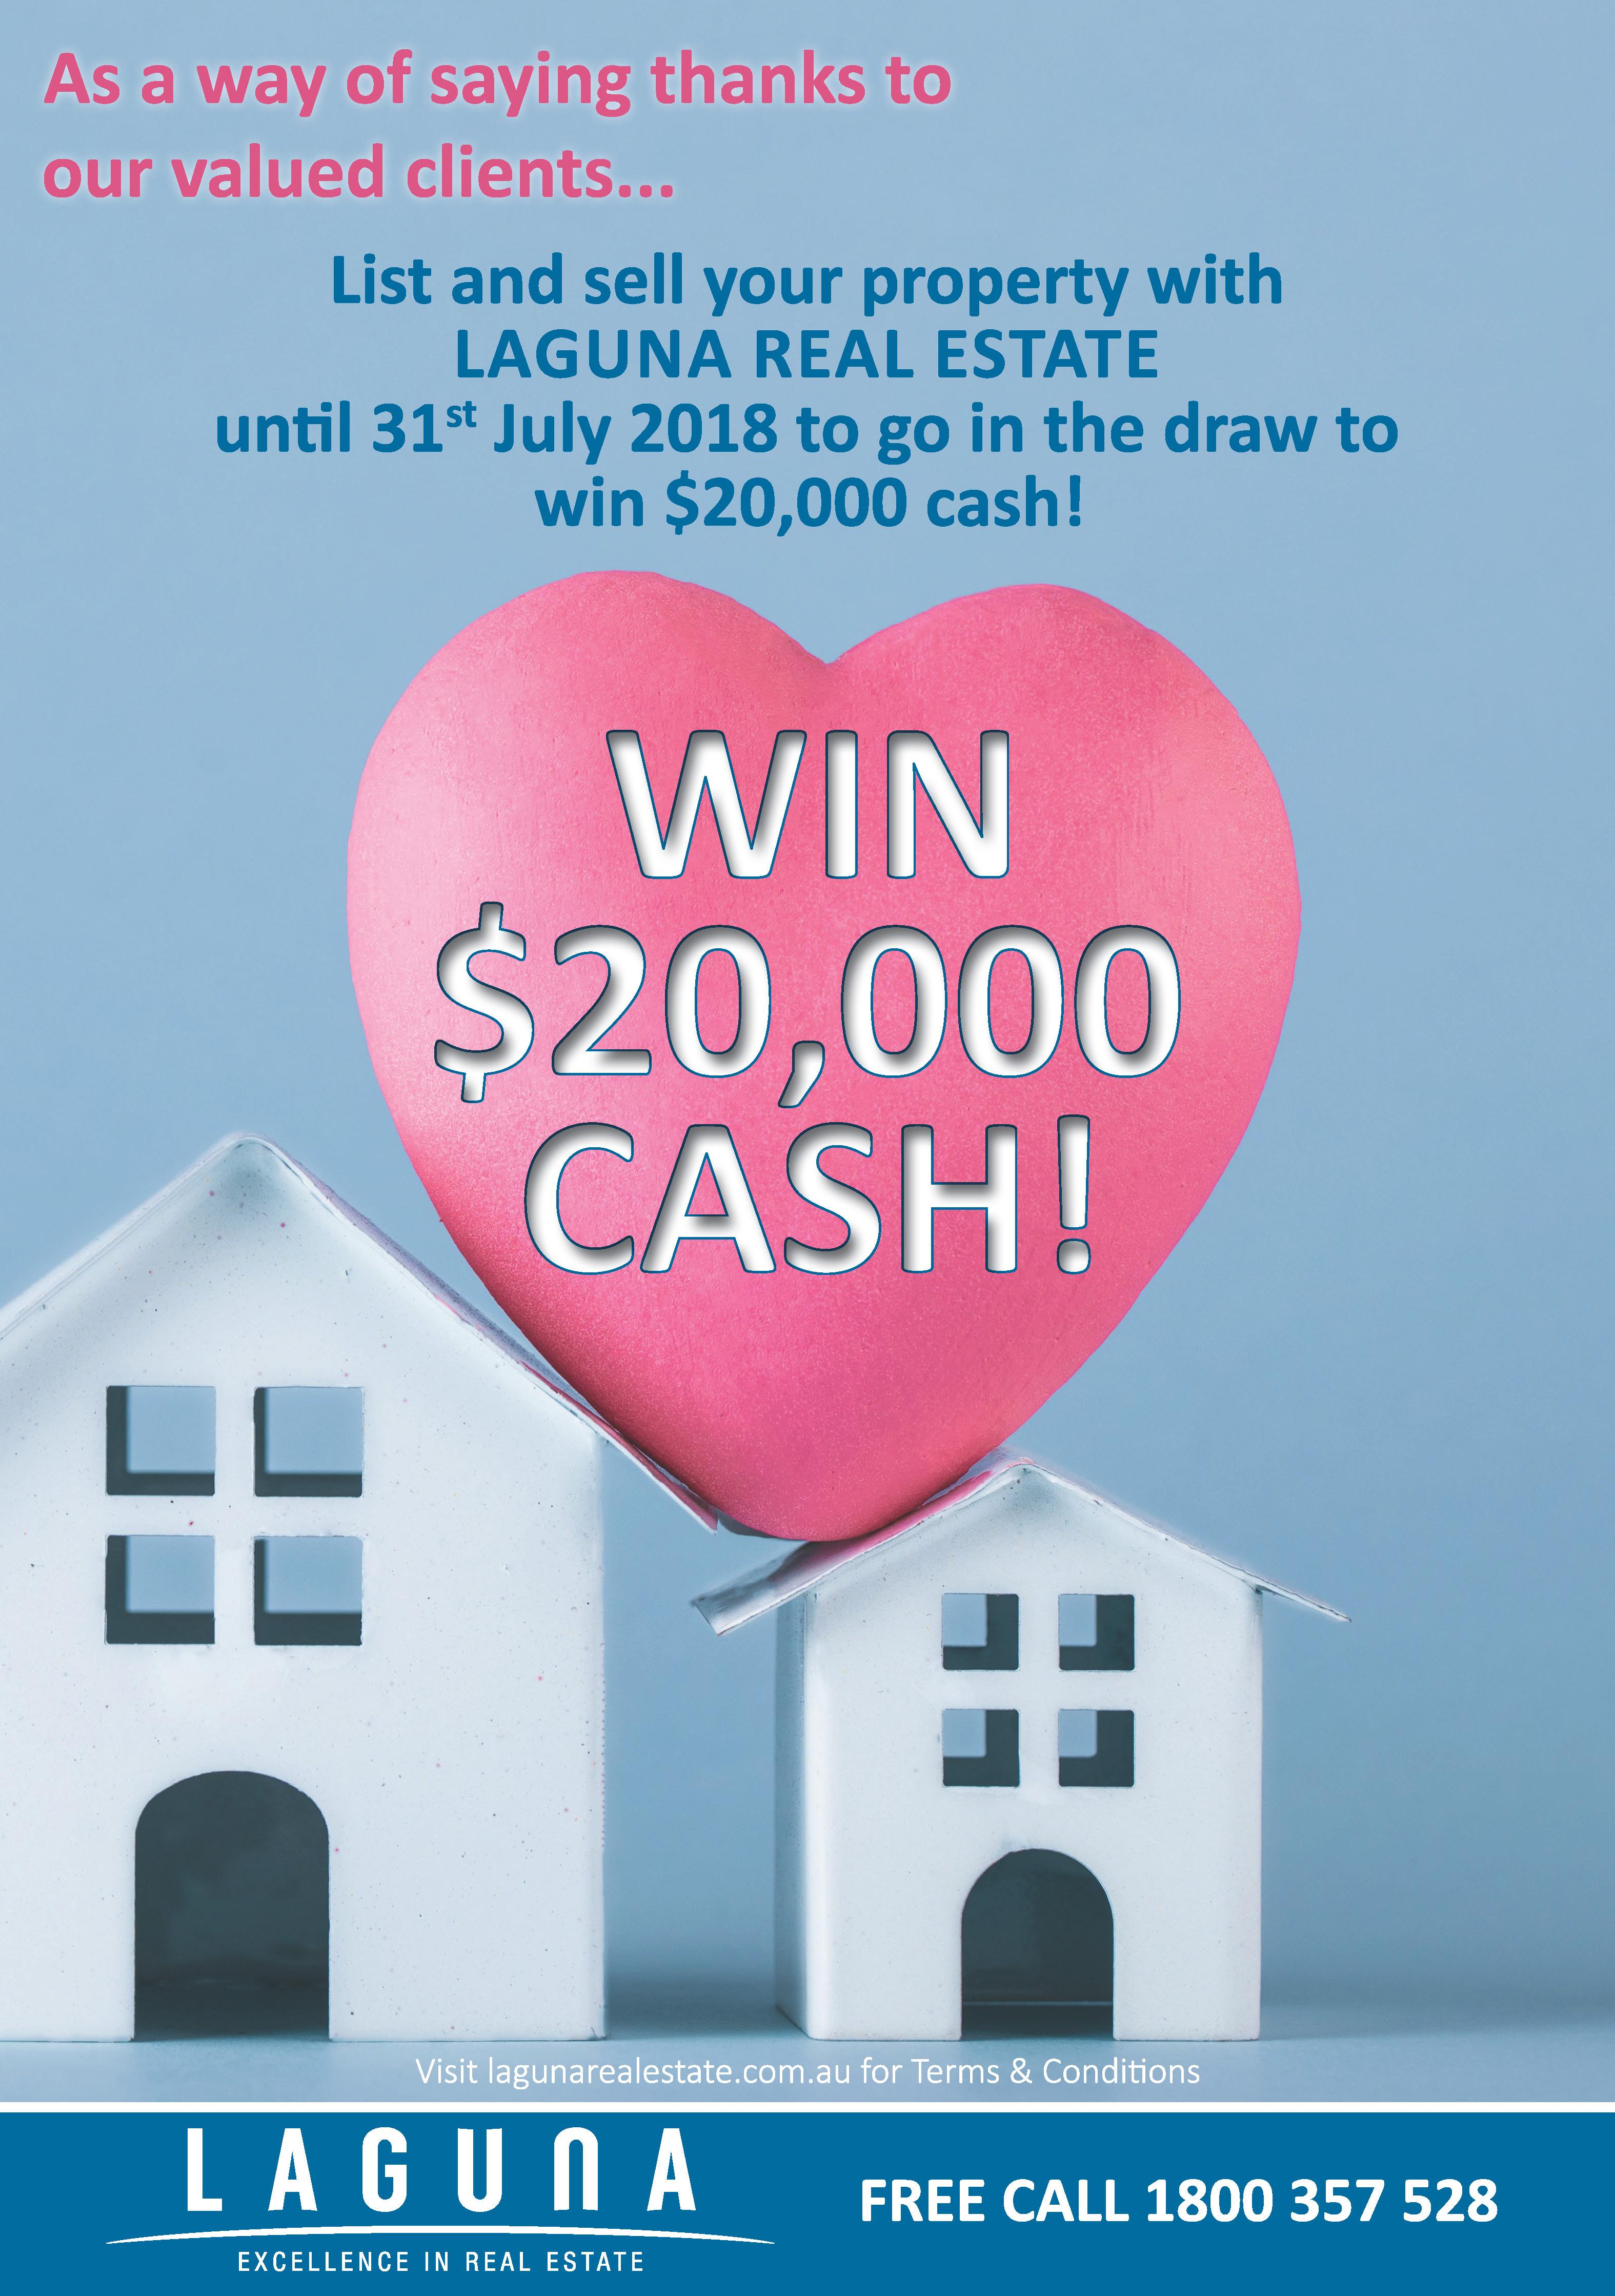 $20,000 Cash Giveaway